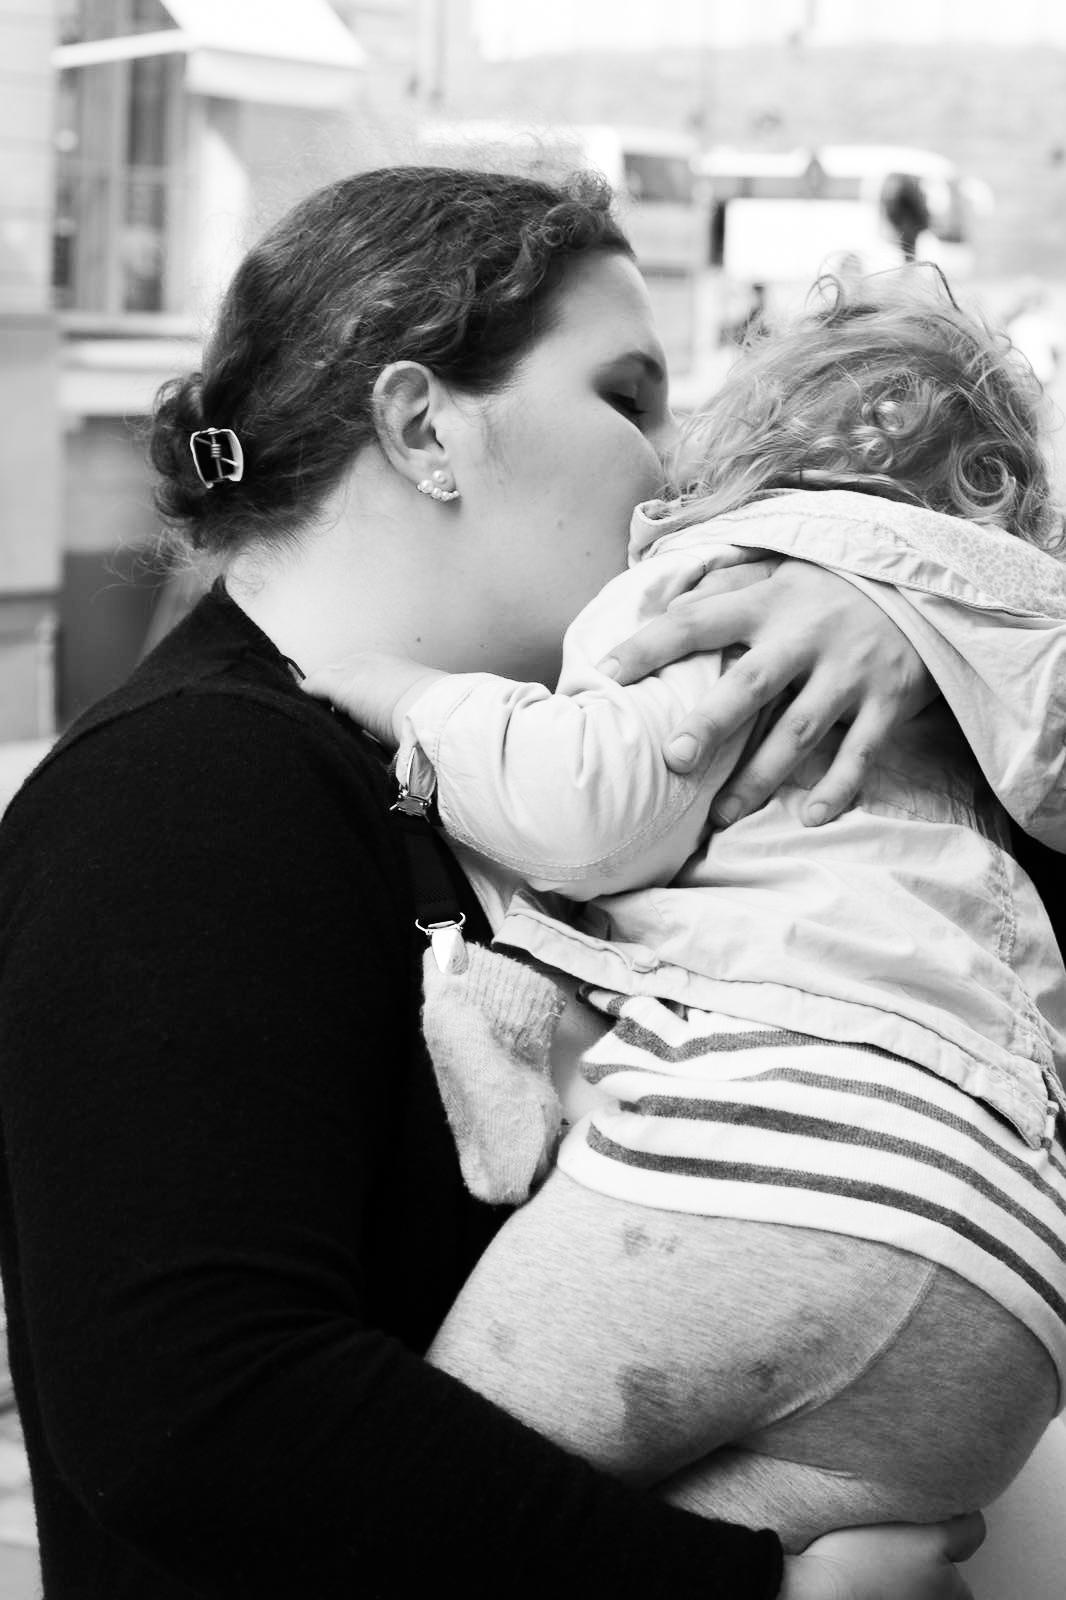 lapsiperhe, lapset, perhe, äitiys, parisuhde, rakkaus, vauva,